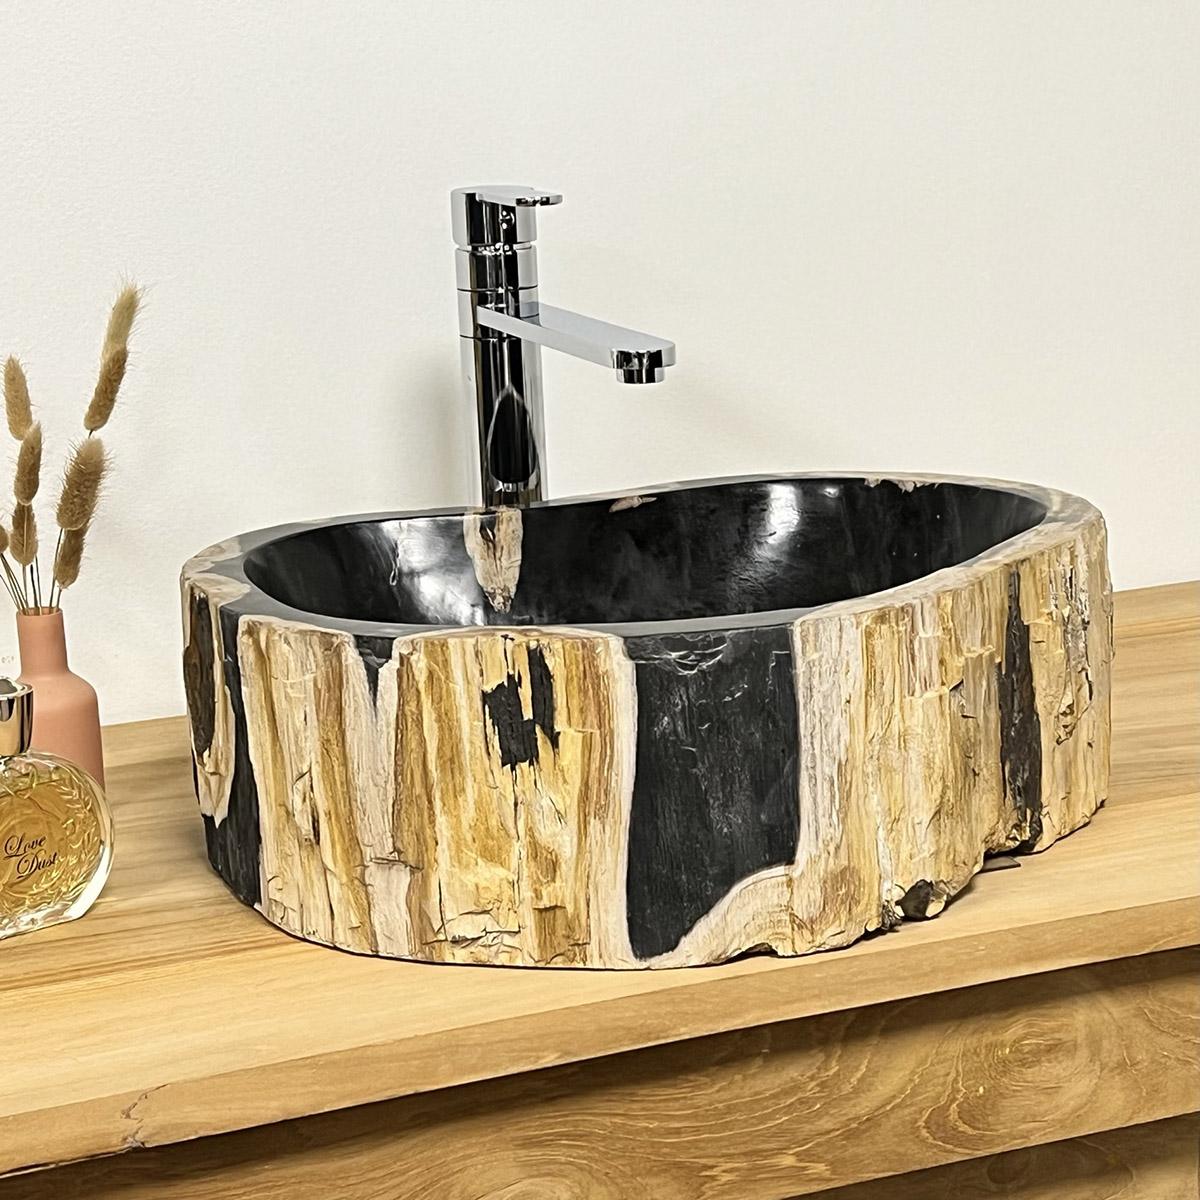 vasque salle de bain vasque en bois fossilis 75 cm. Black Bedroom Furniture Sets. Home Design Ideas